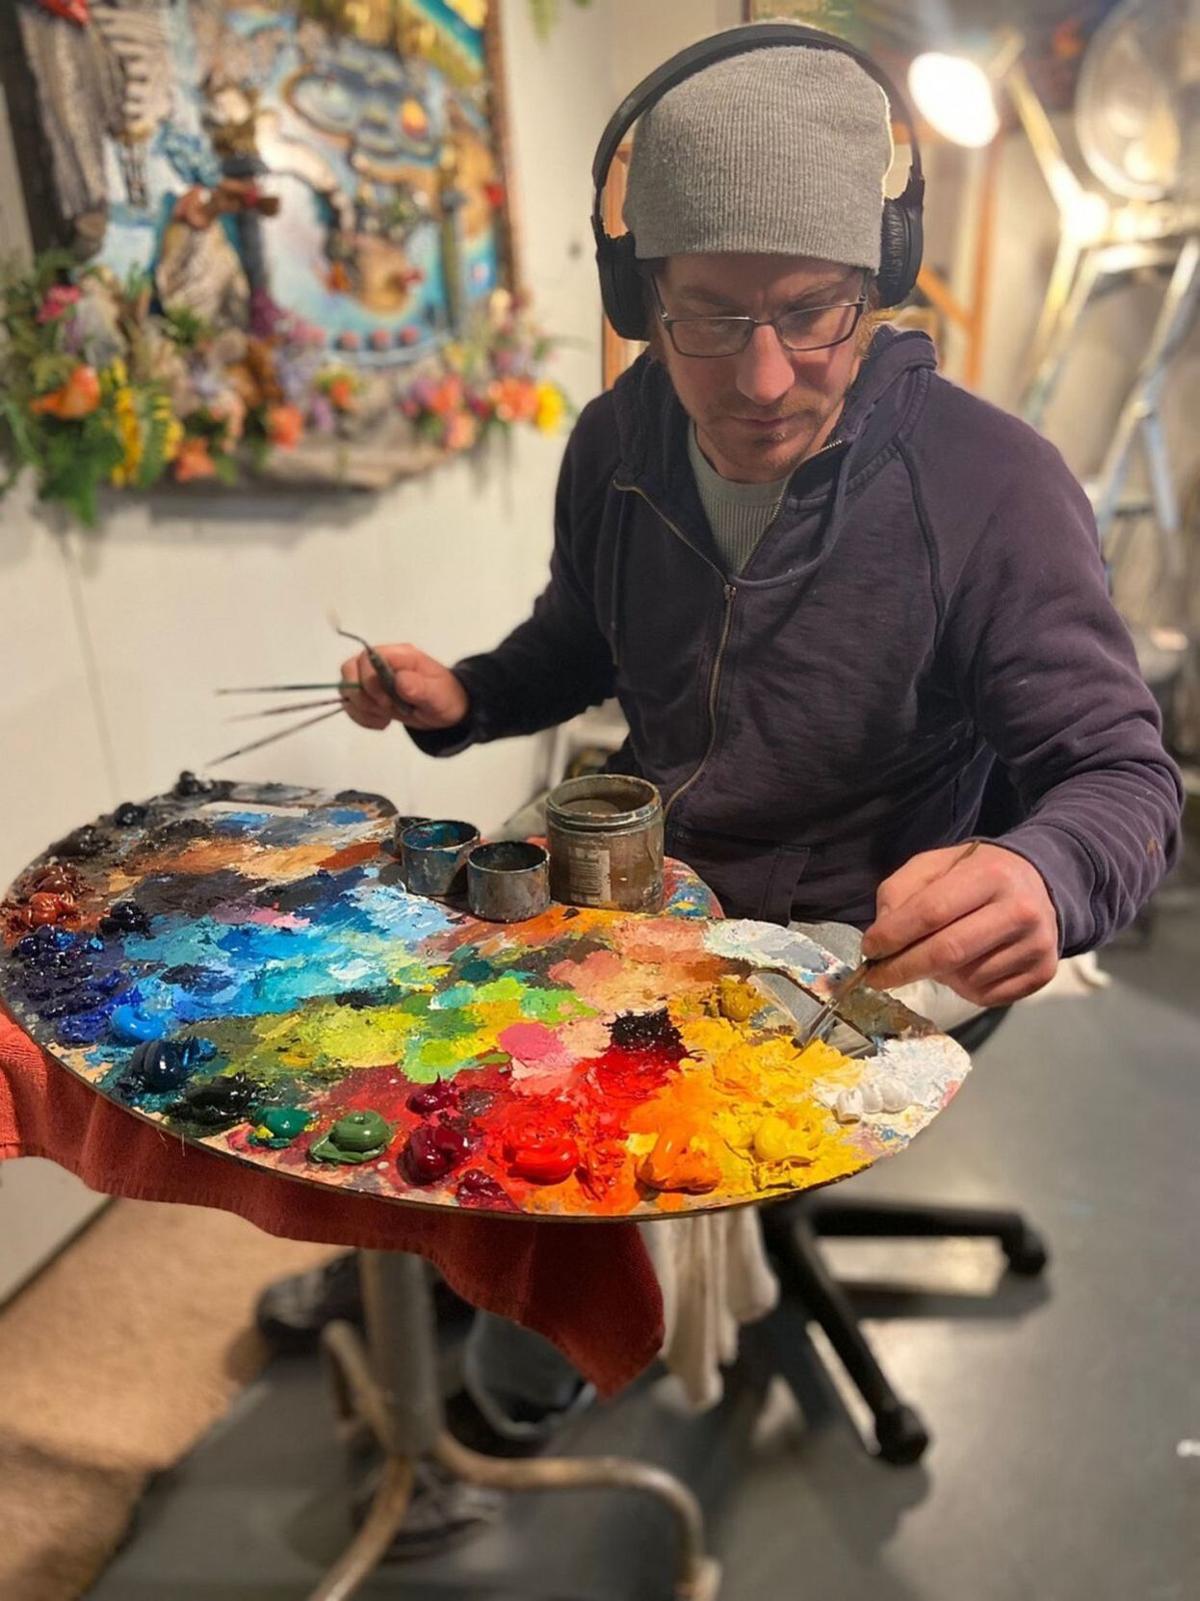 Angwin artist Will Callnan